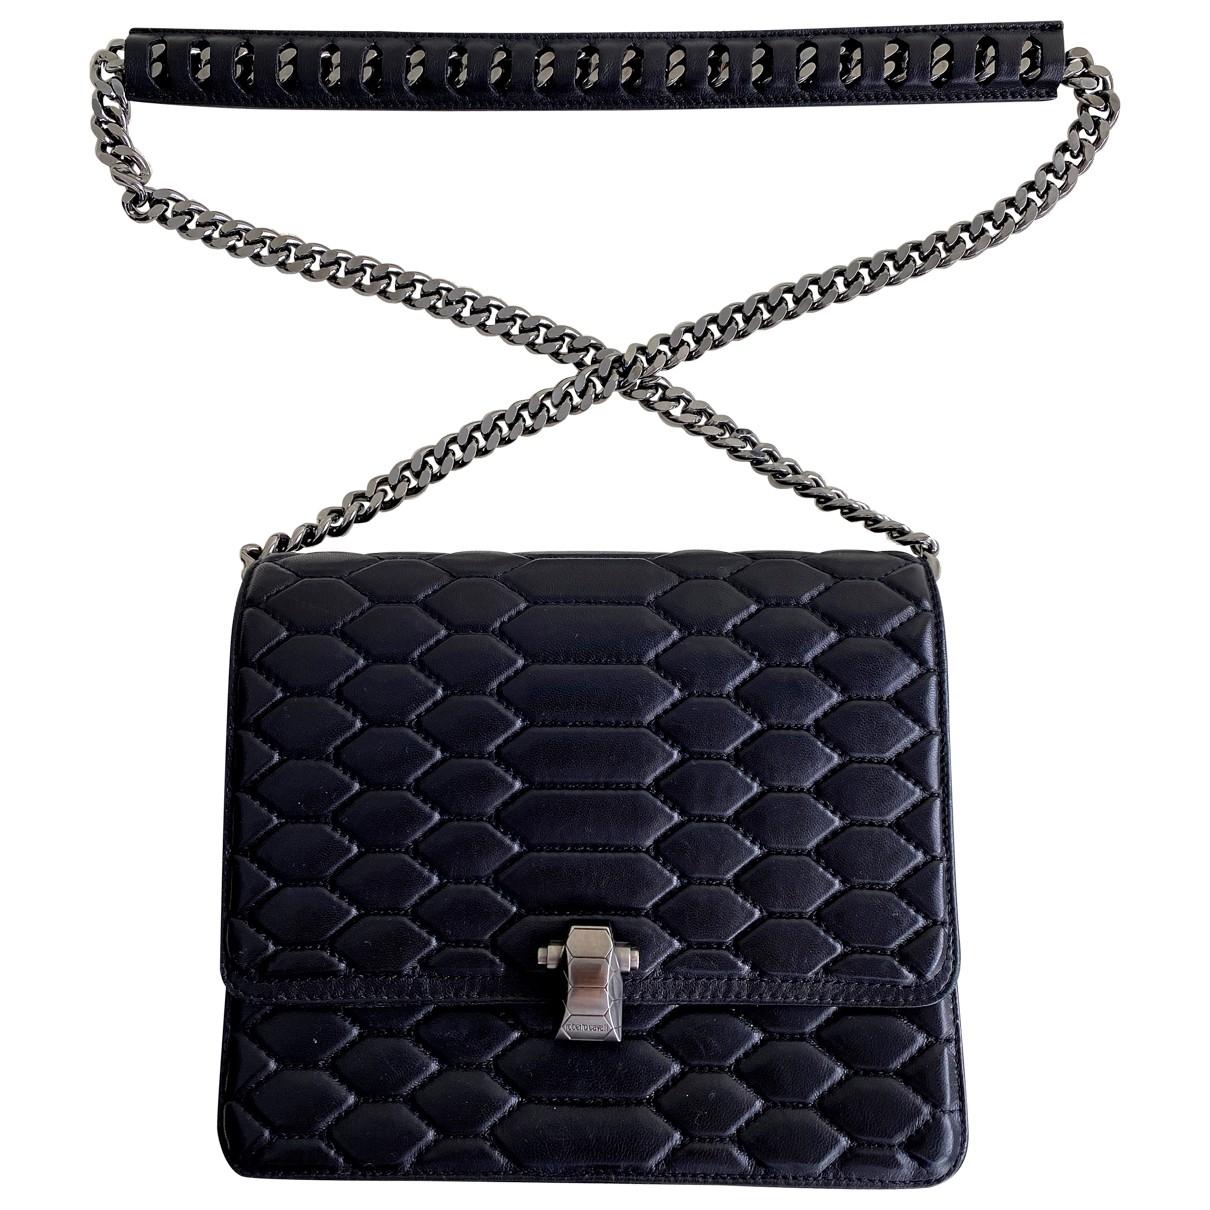 Roberto Cavalli \N Handtasche in  Schwarz Leder